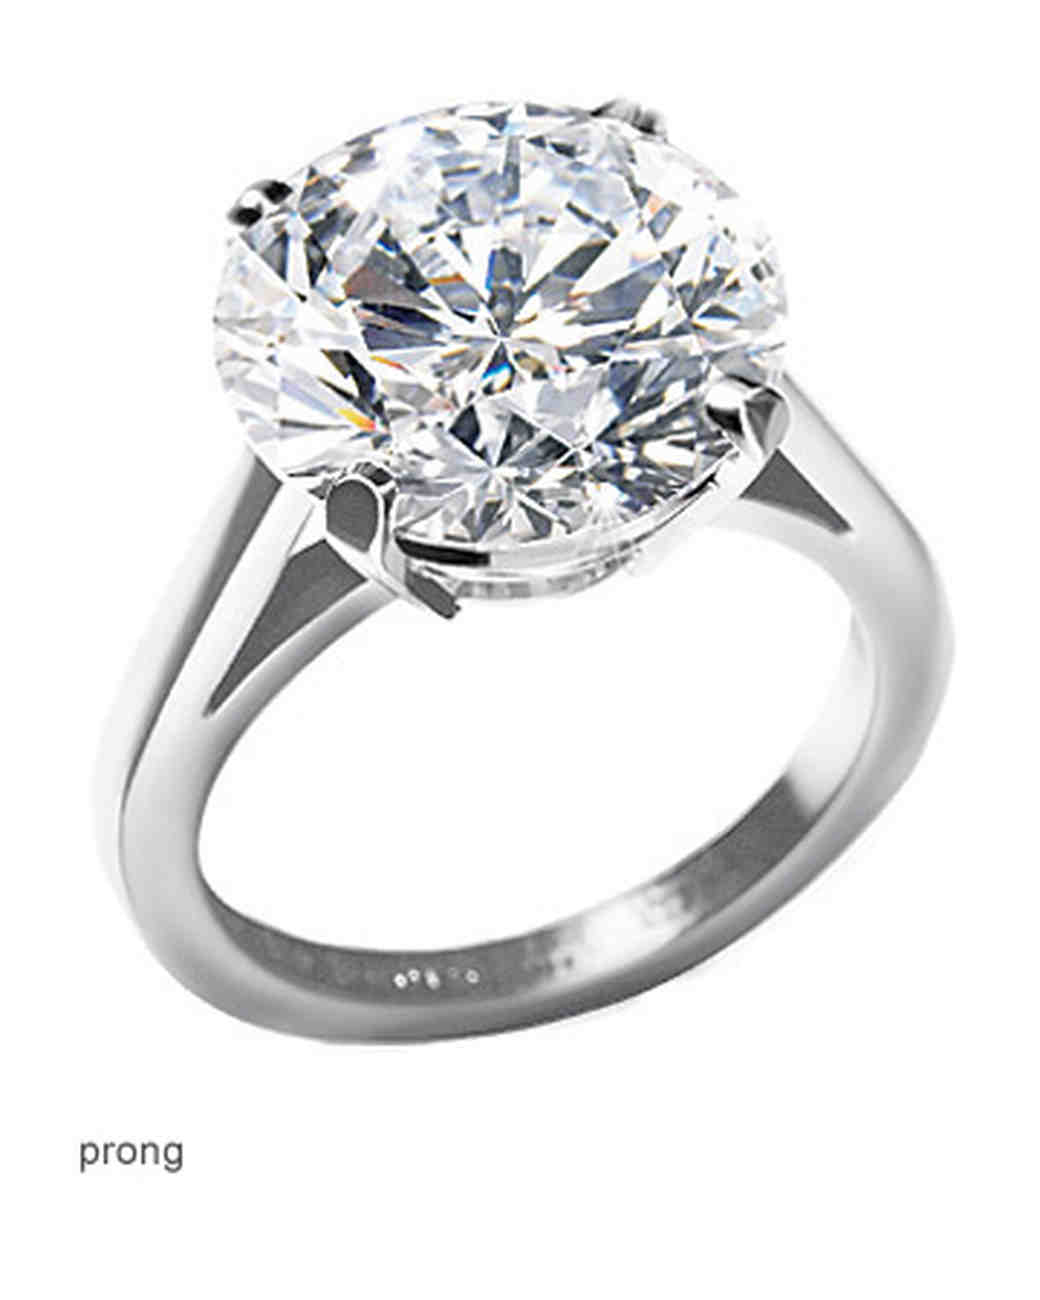 Deconstructing Your Diamond